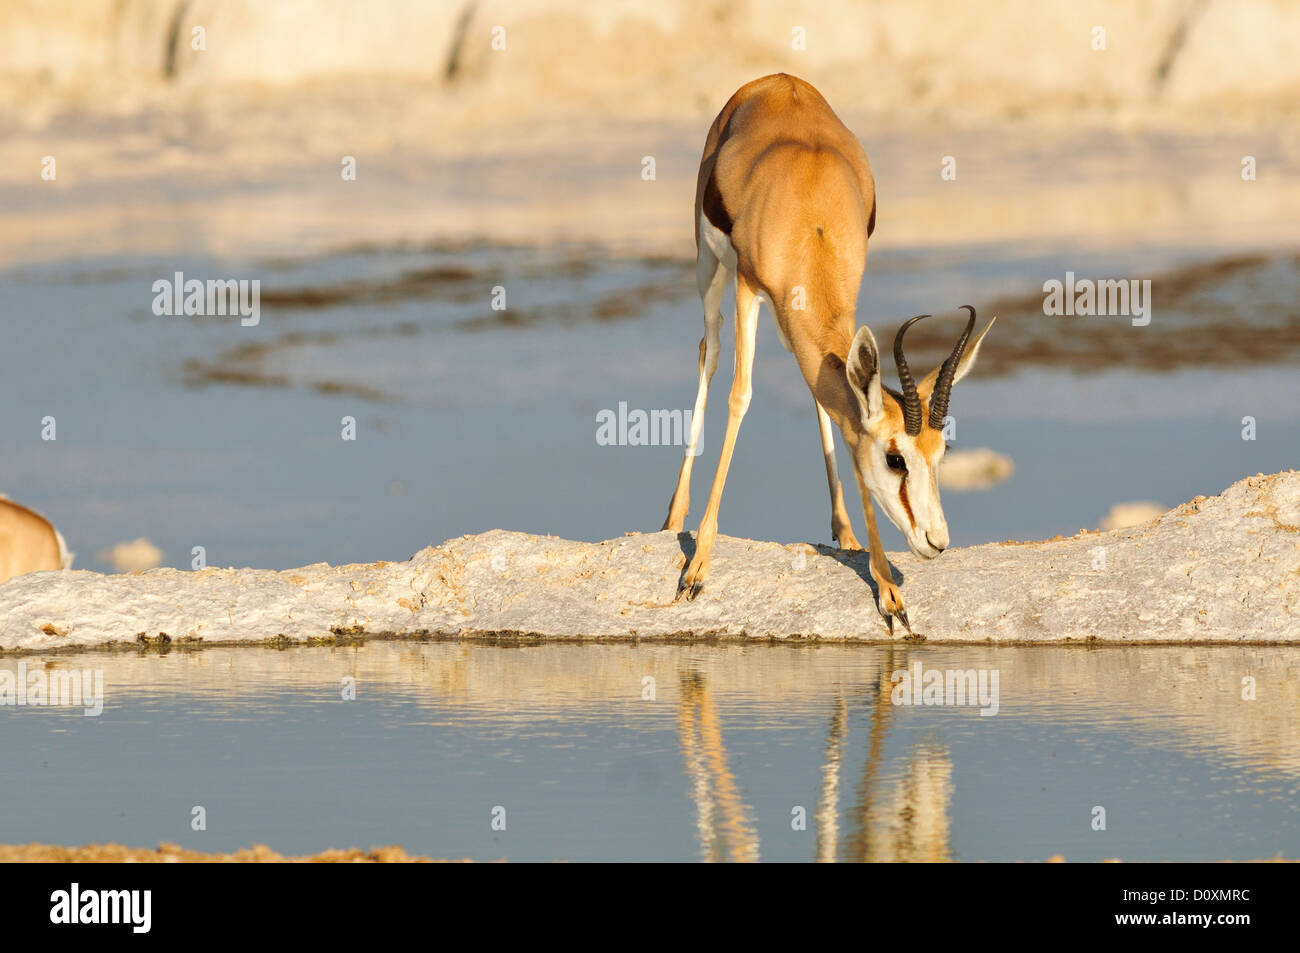 Afrika, Etosha Nationalpark, Namibia, Afrika, Tier, Antilope, Tier, trinken, Horizontal, Ebenen, Reflexion, Safari, Stockbild